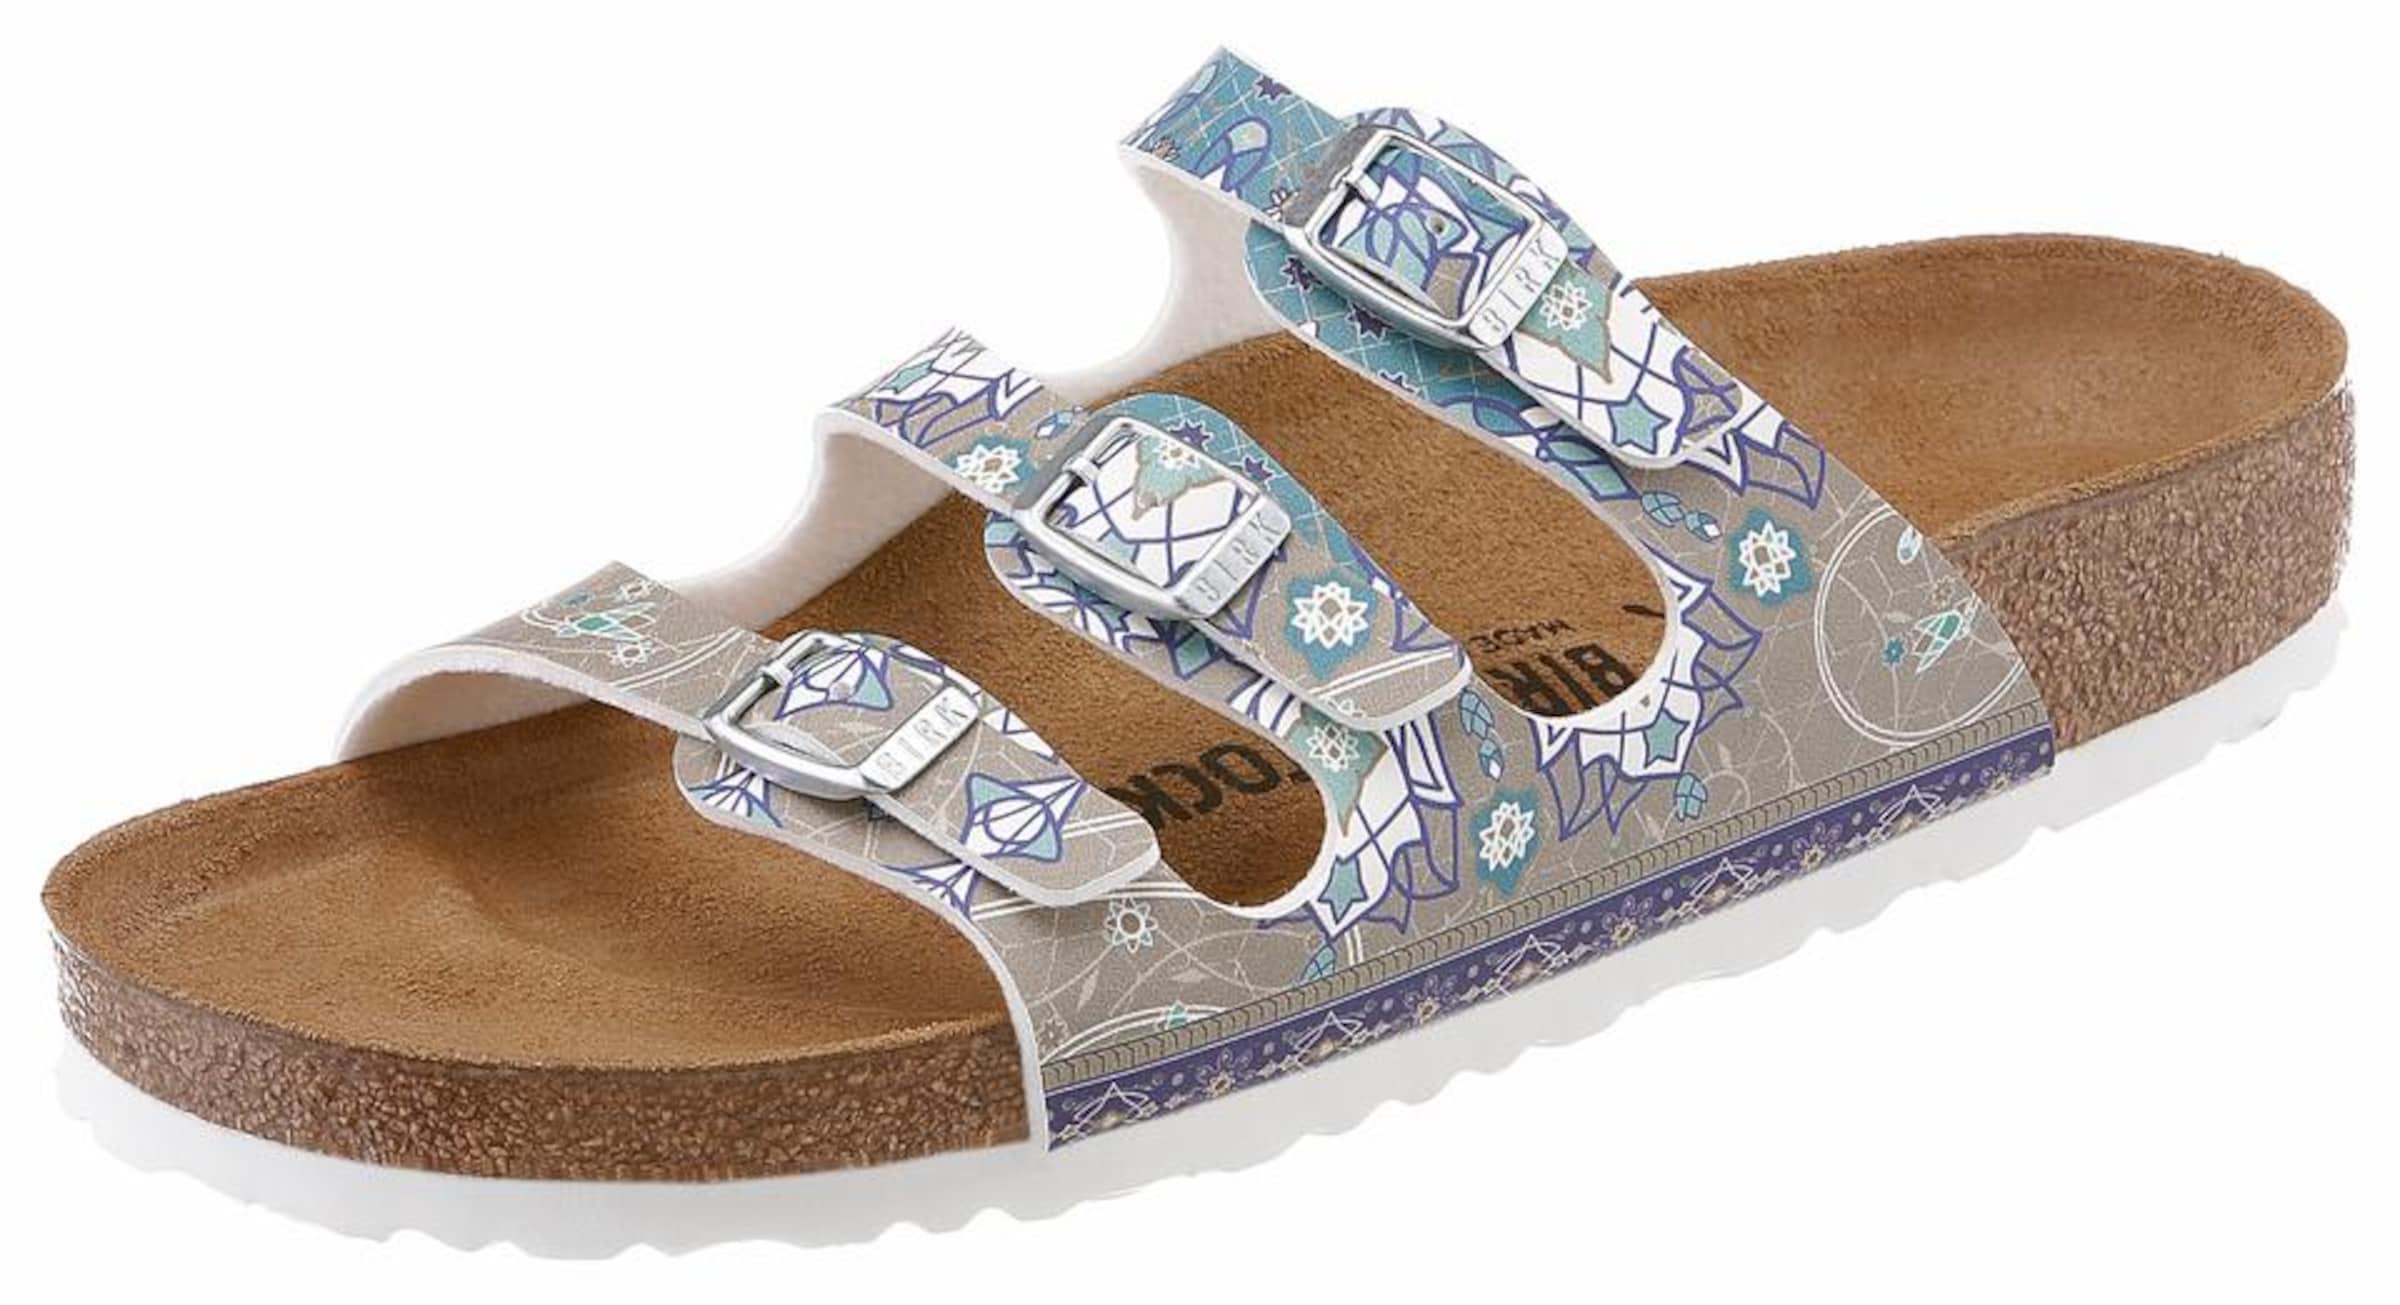 BIRKENSTOCK Pantolette FLORIDA Verschleißfeste billige Schuhe